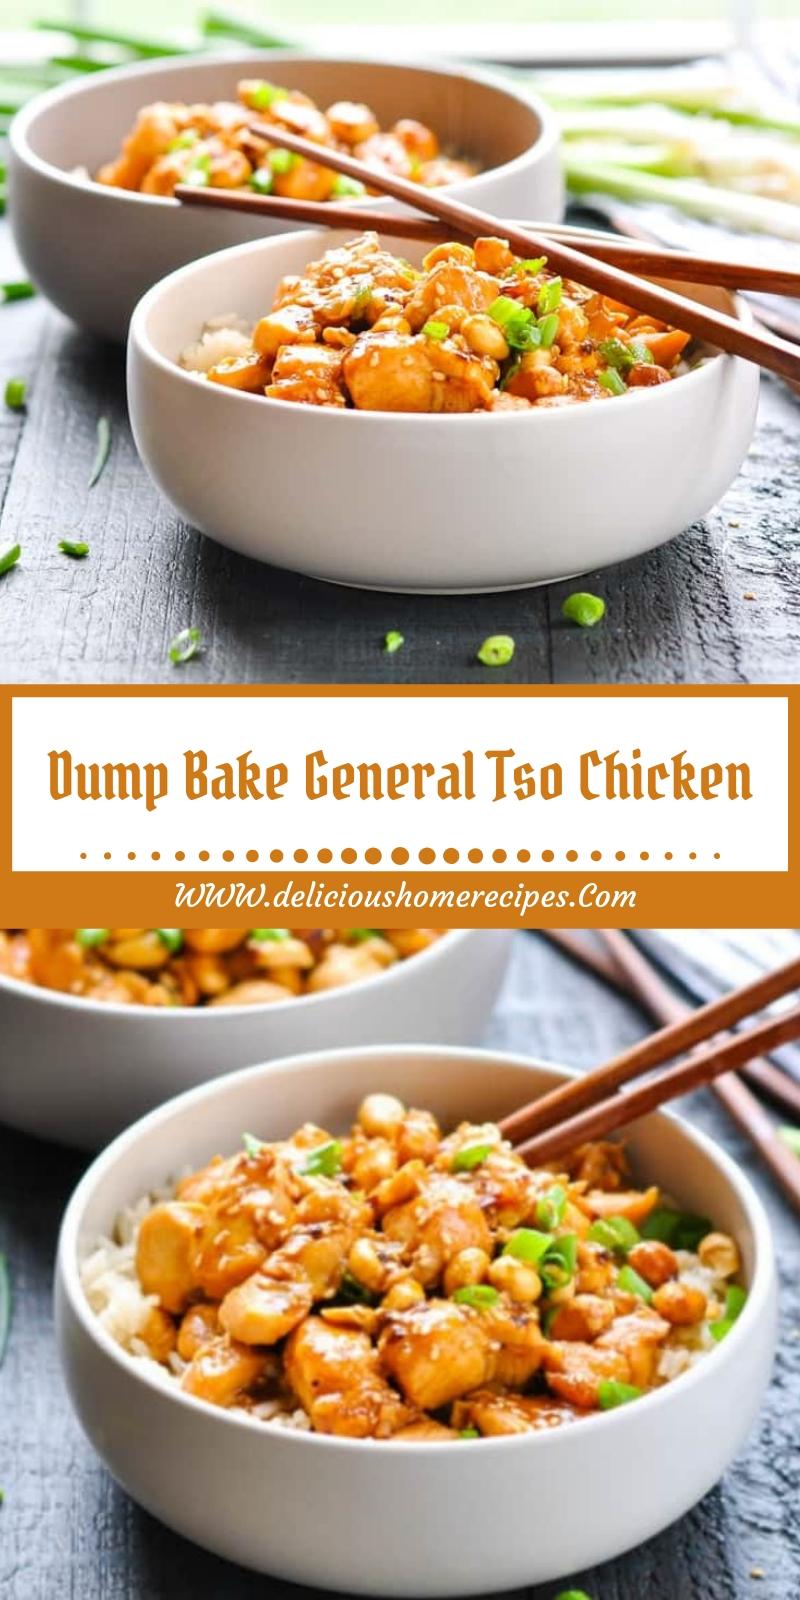 Dump Bake General Tso Chicken